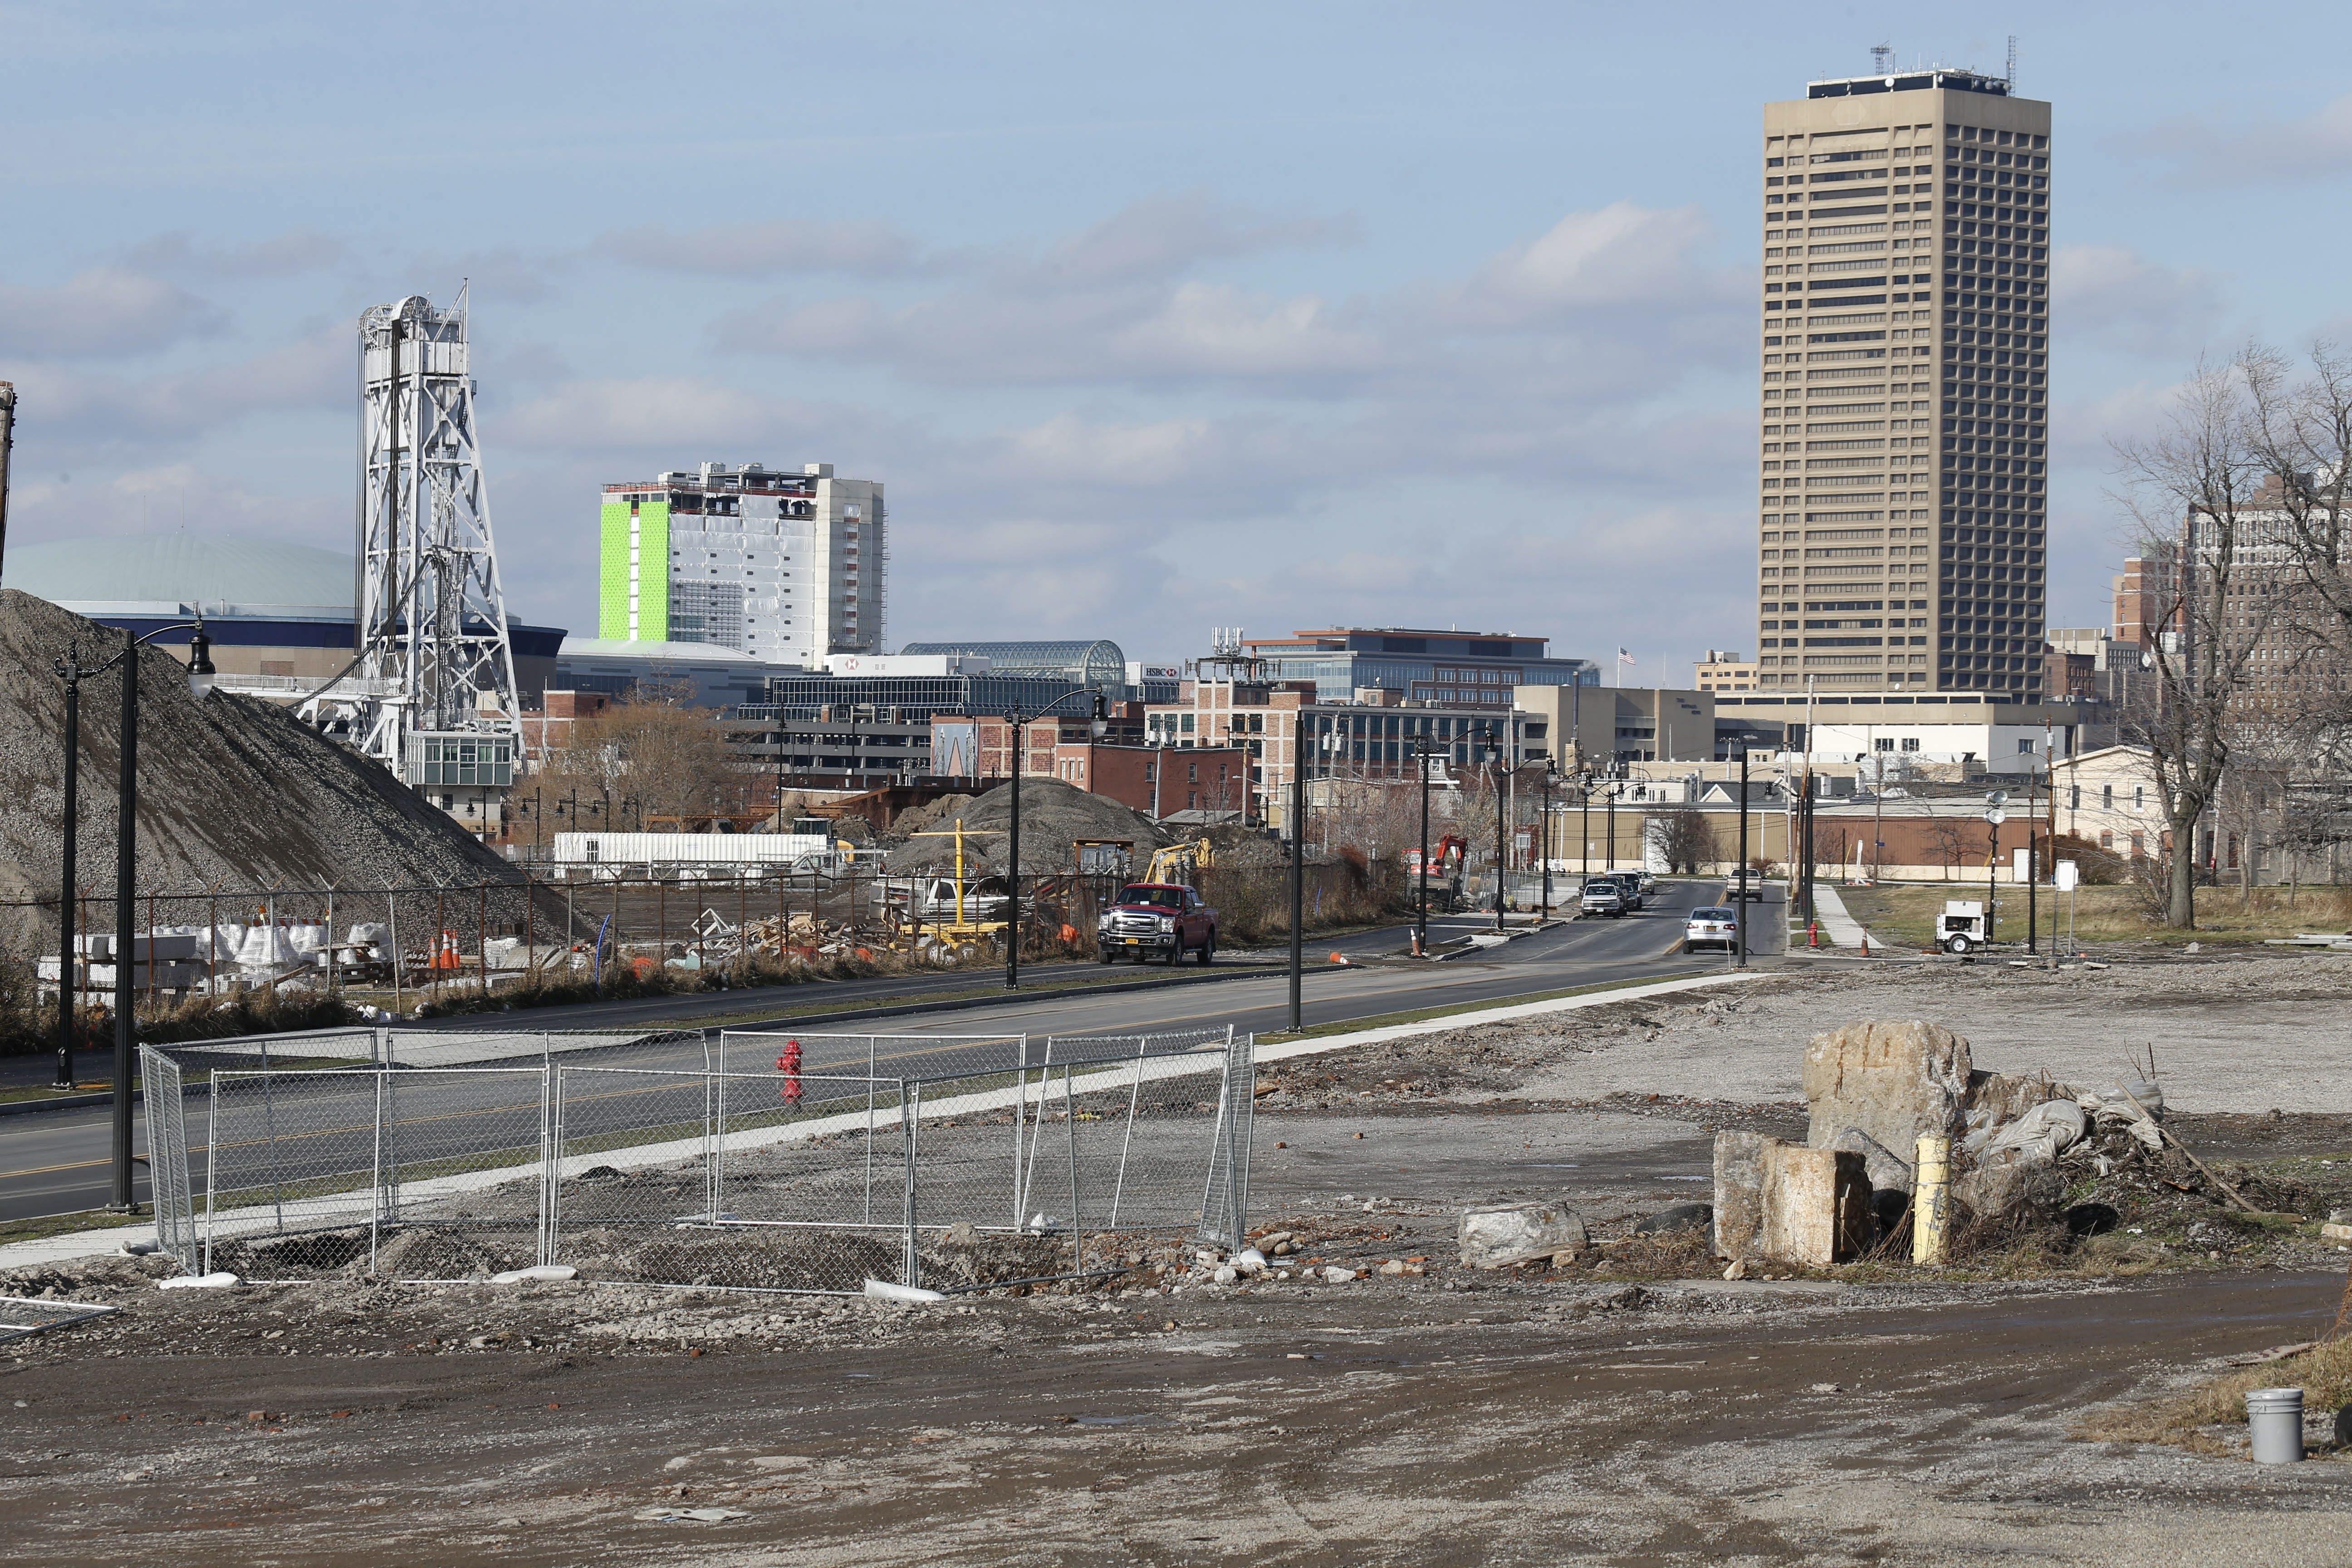 Proposed new development will bring Ohio Street back to life. (Derek Gee/Buffalo News)